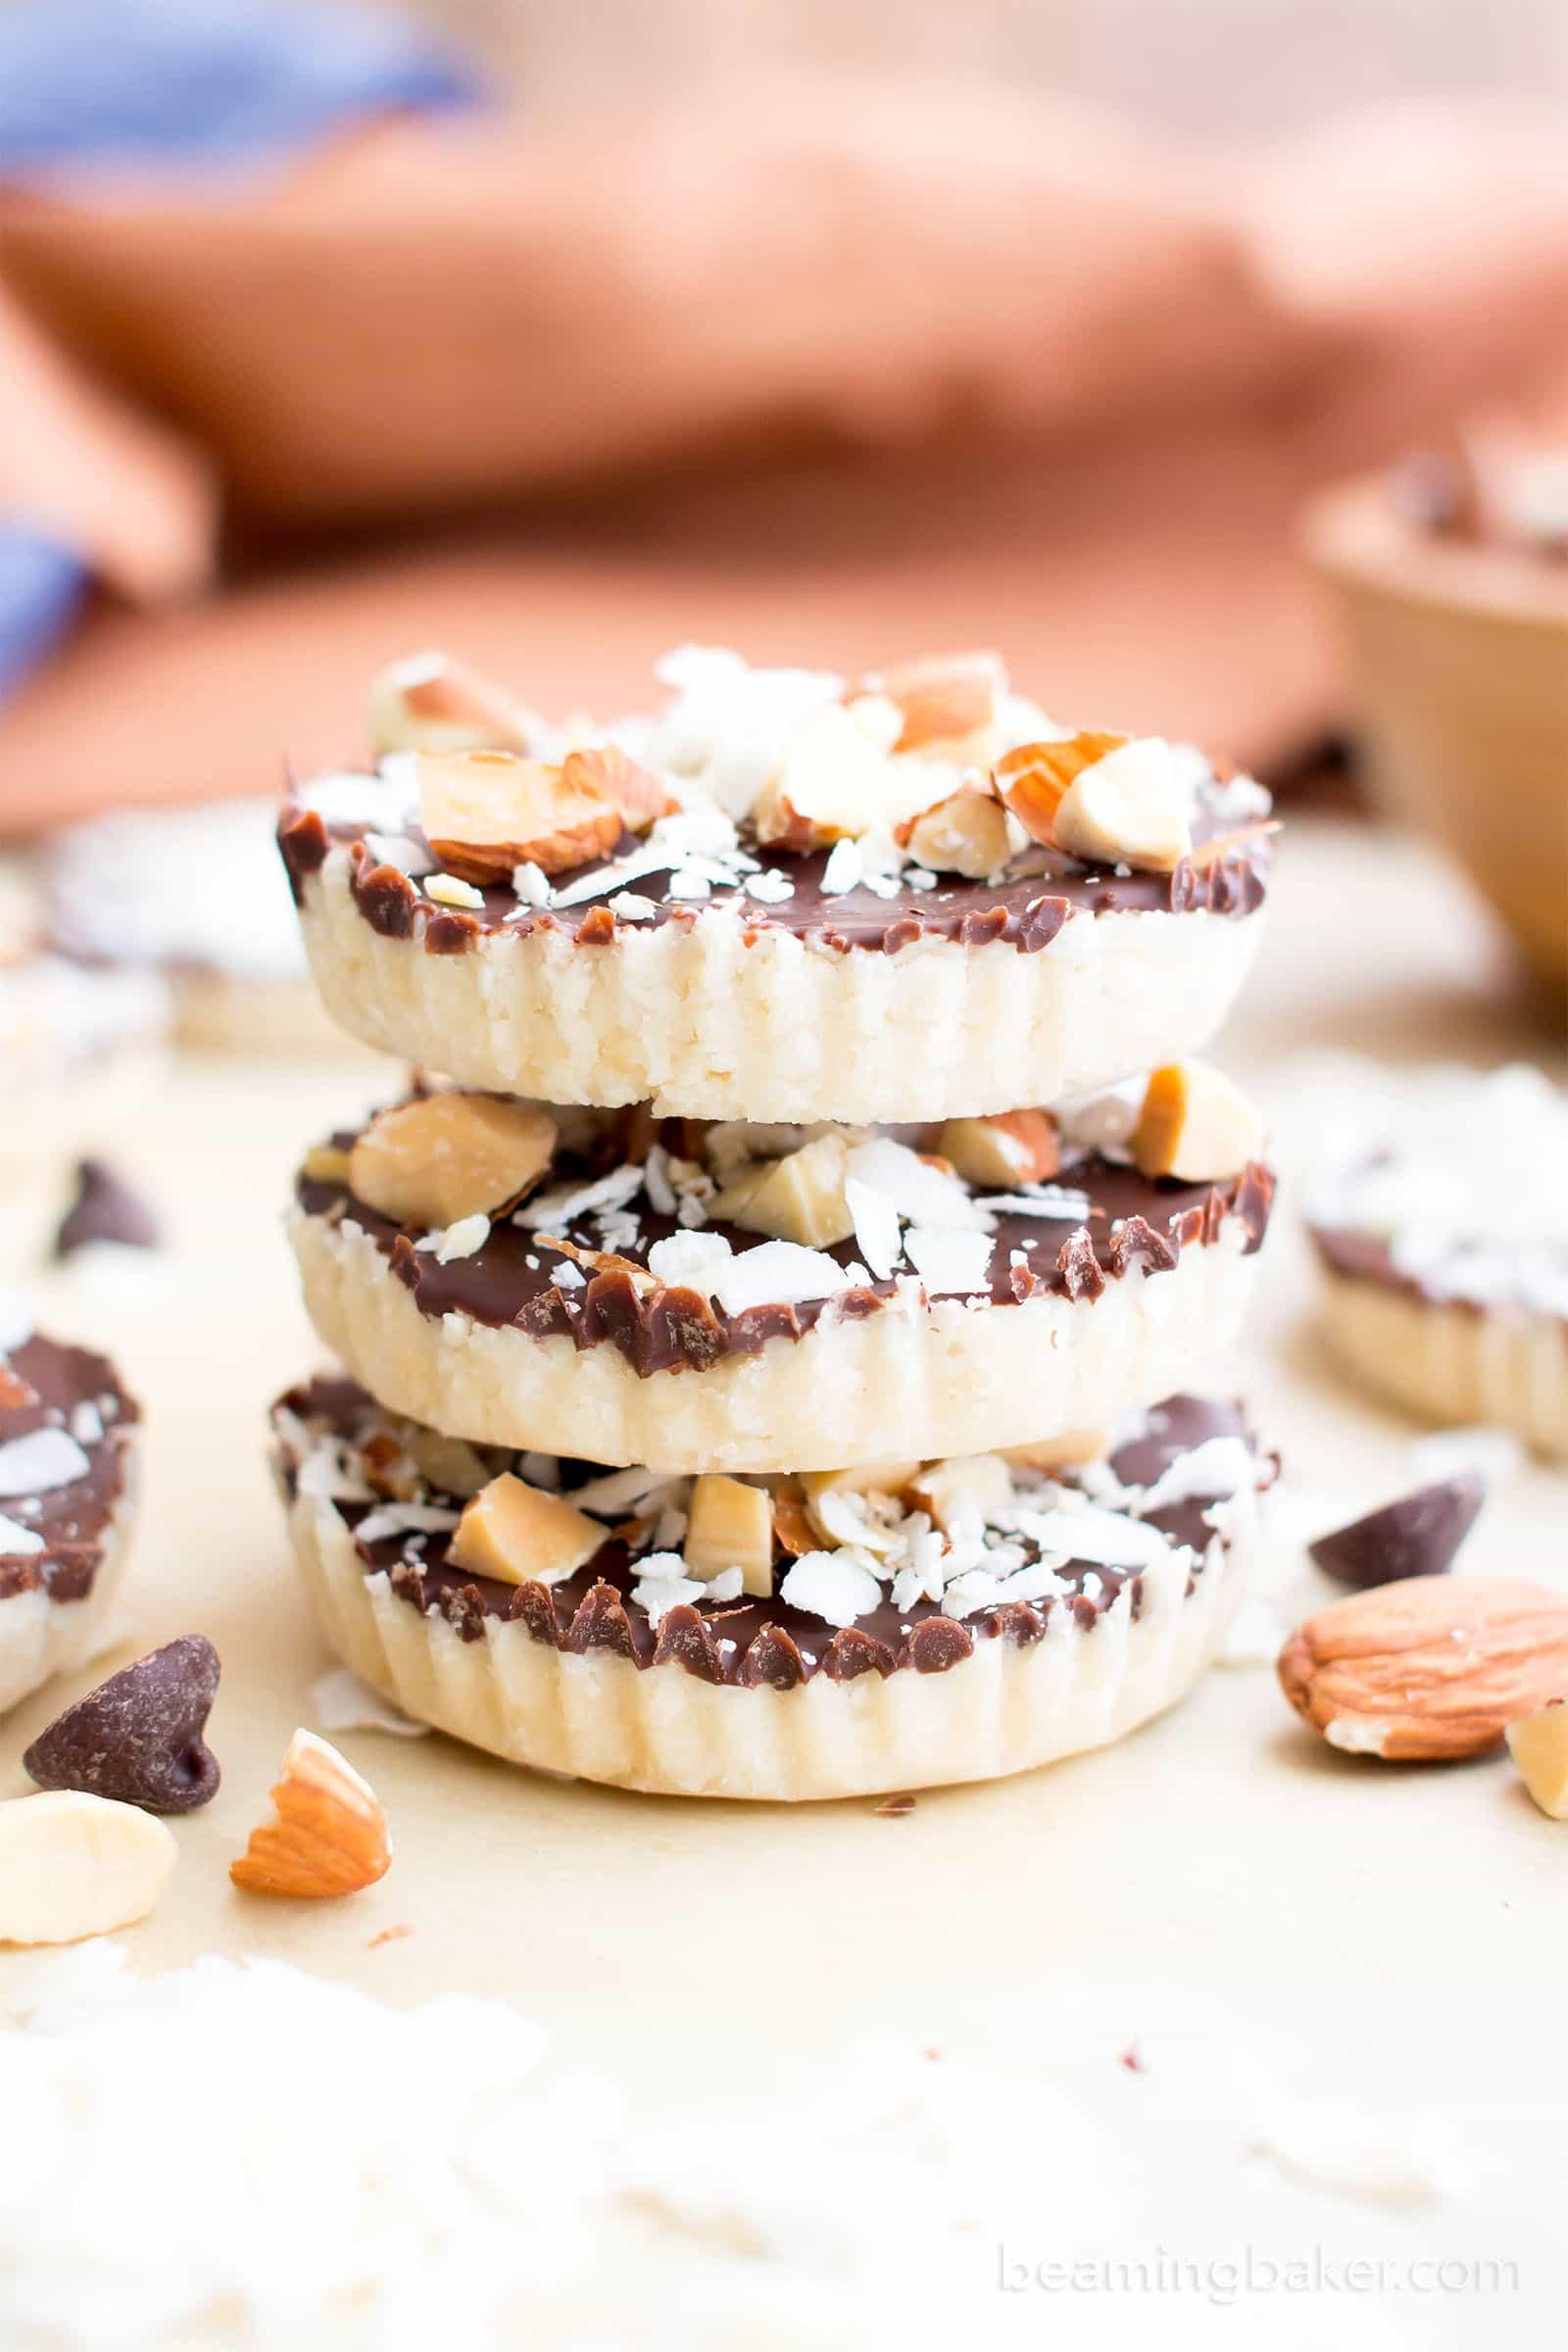 Homemade Almond Joy Cups (Paleo, V, GF): a 5-ingredient recipe for rich, nutty Almond Joy cups layered in velvety chocolate. #Paleo #Vegan #GlutenFree #5Ingredient   BeamingBaker.com